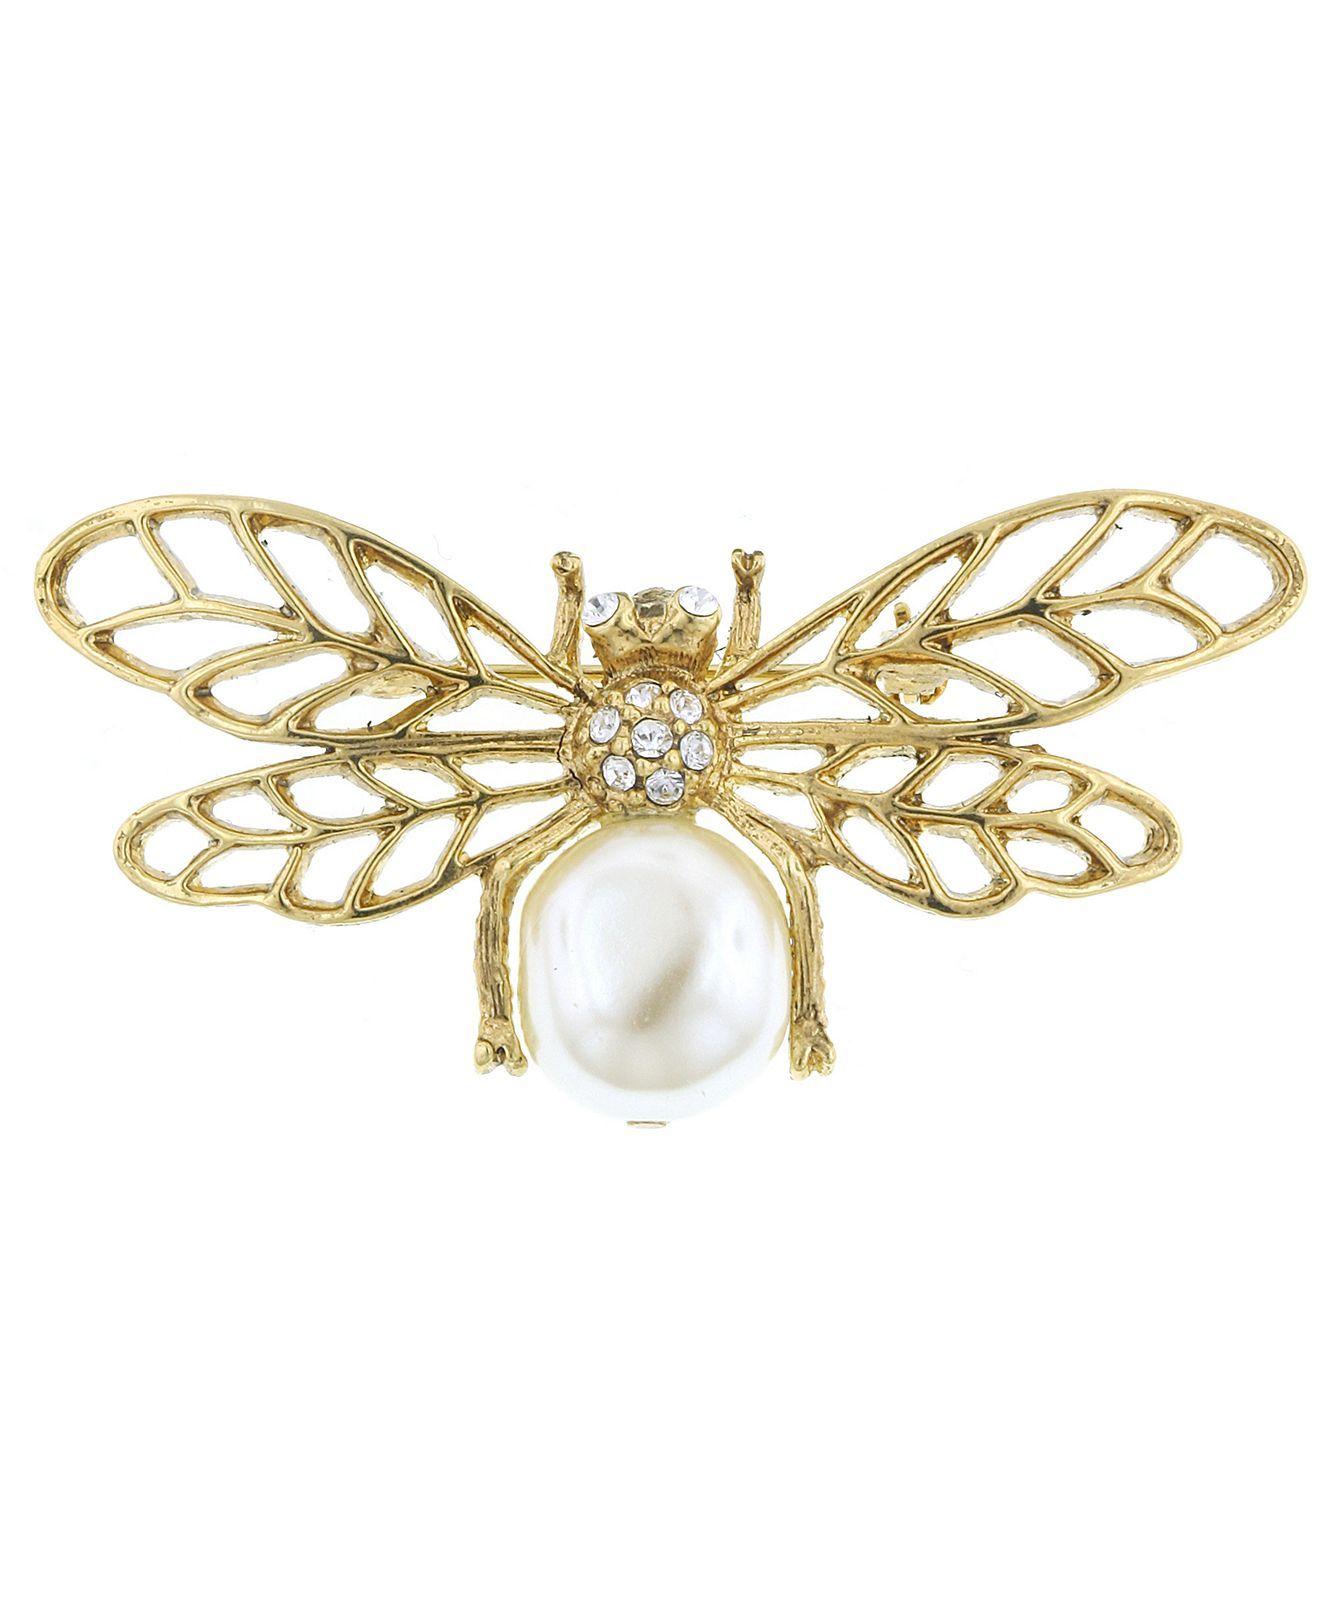 51246fe577b Acrylic Pearl Bee Pin - Macy's | My Style | Bee brooch, Brooch ...